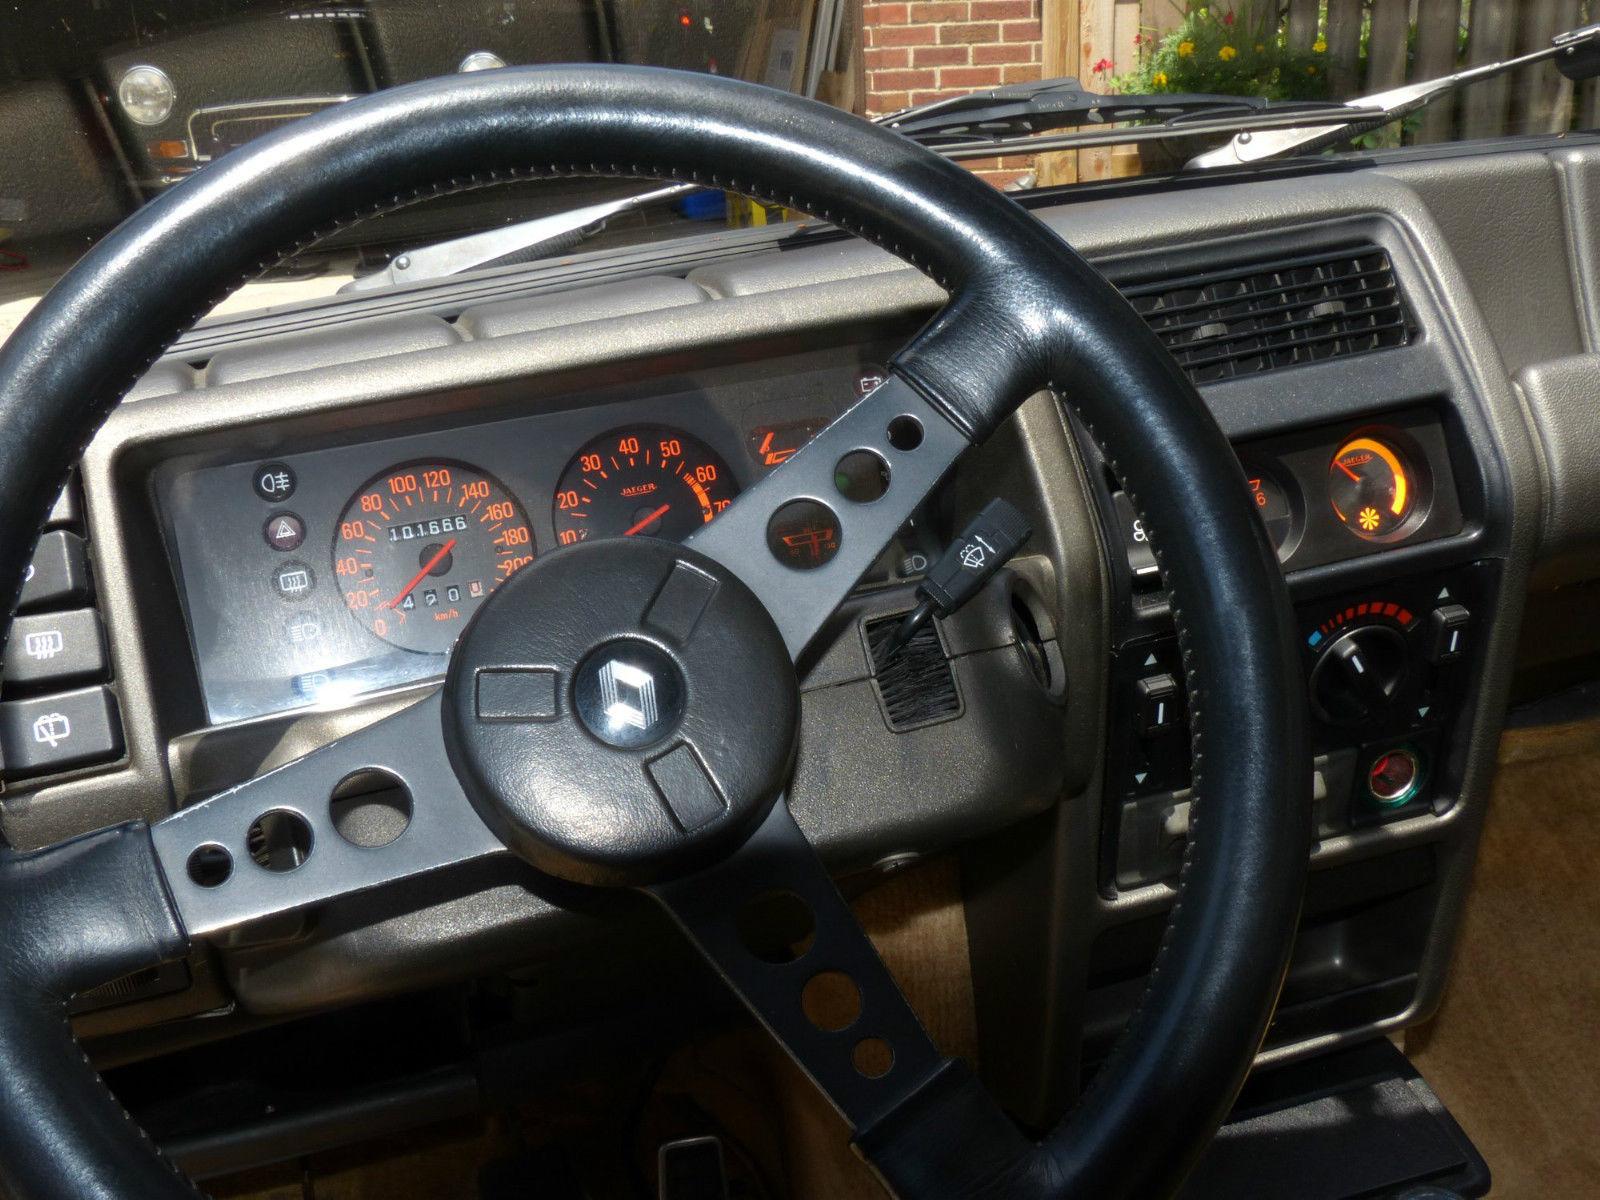 Renault 5 Turbo 20,3 millió forintért